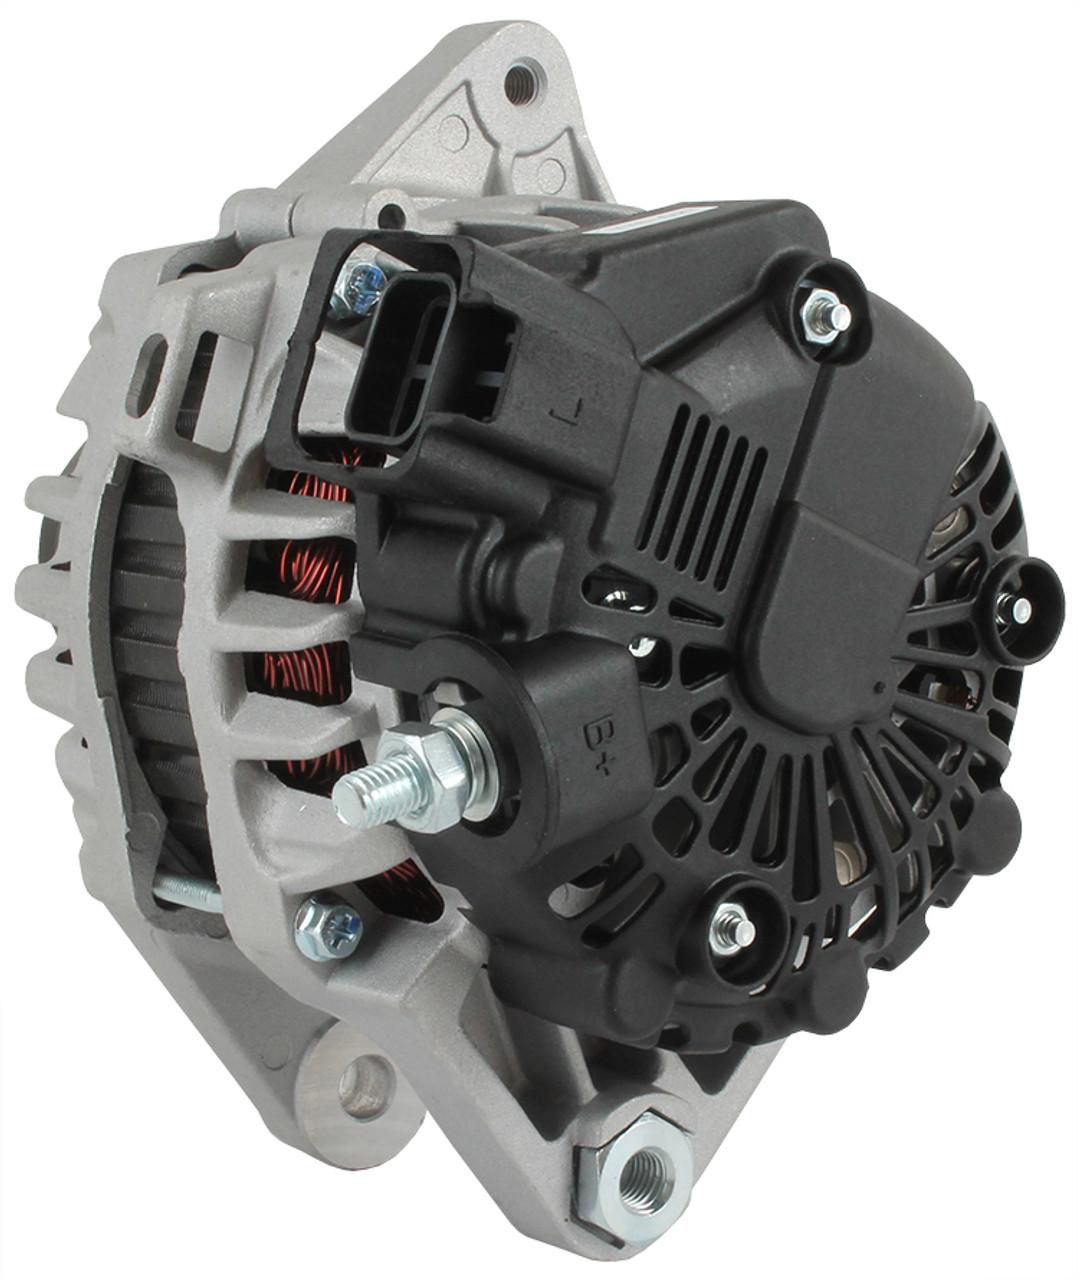 New Alternator replaces Valeo 439295 110 Amp 37300-37405 2655516 A0002655516